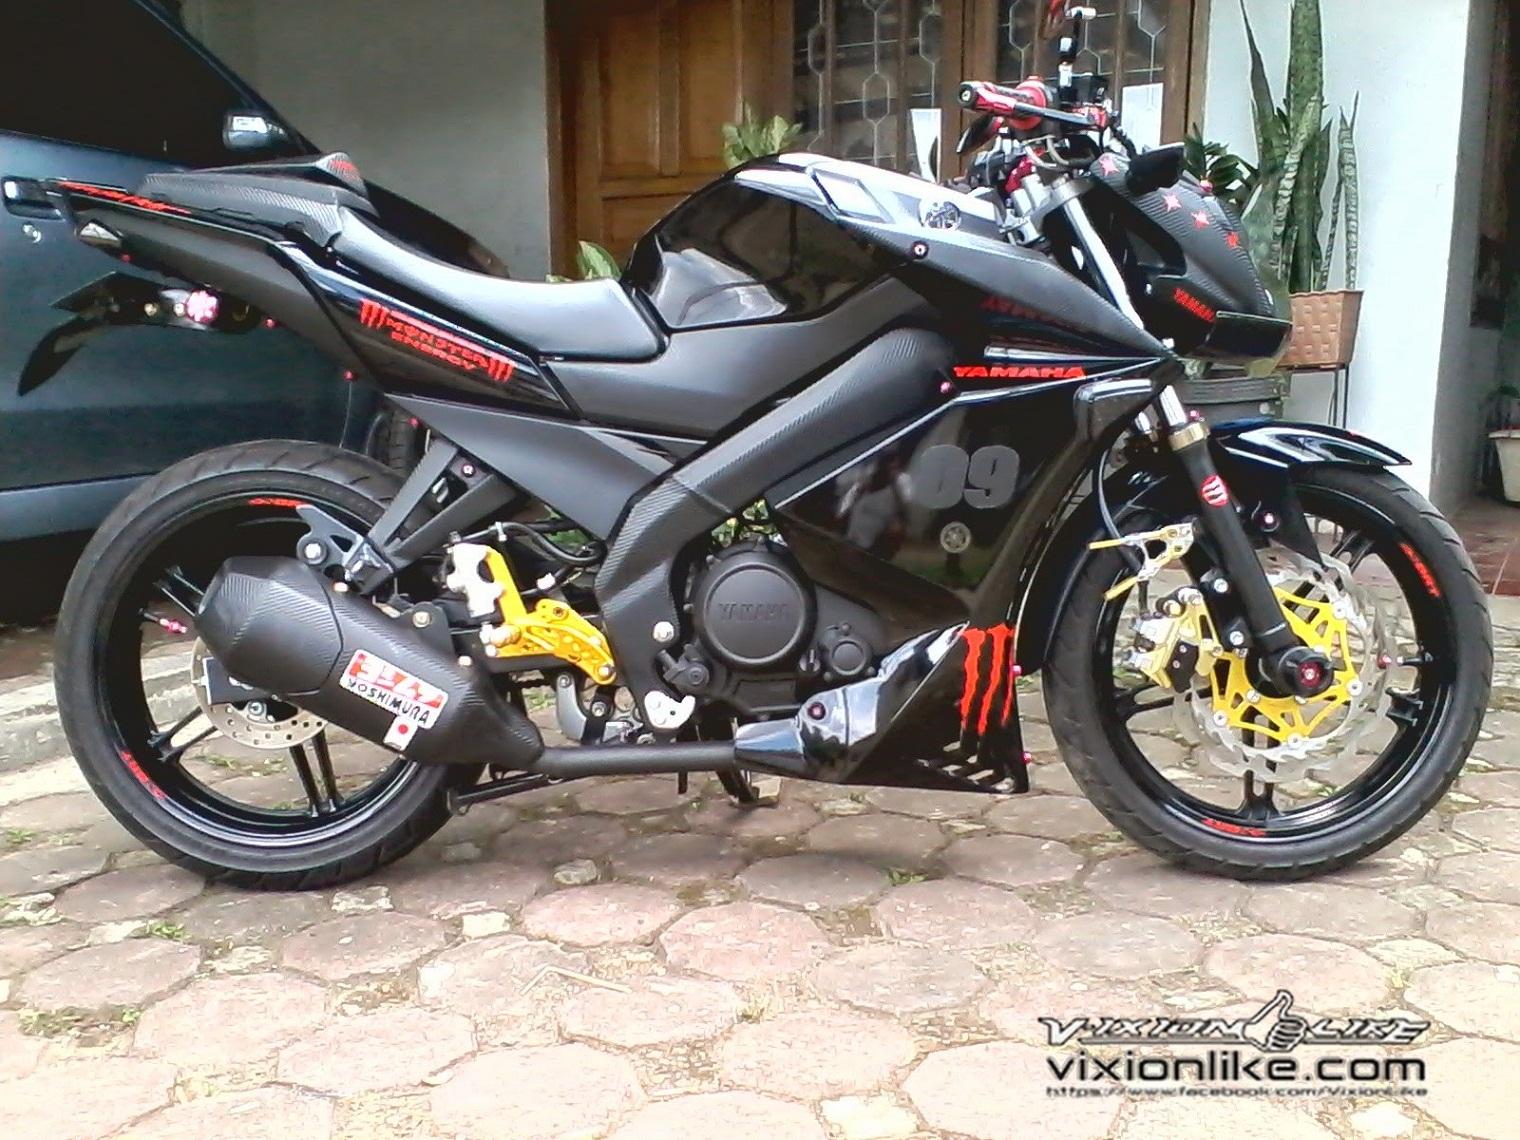 Ide 99 Modifikasi Vixion 2010 Street Fighter Terupdate Motor Runcing